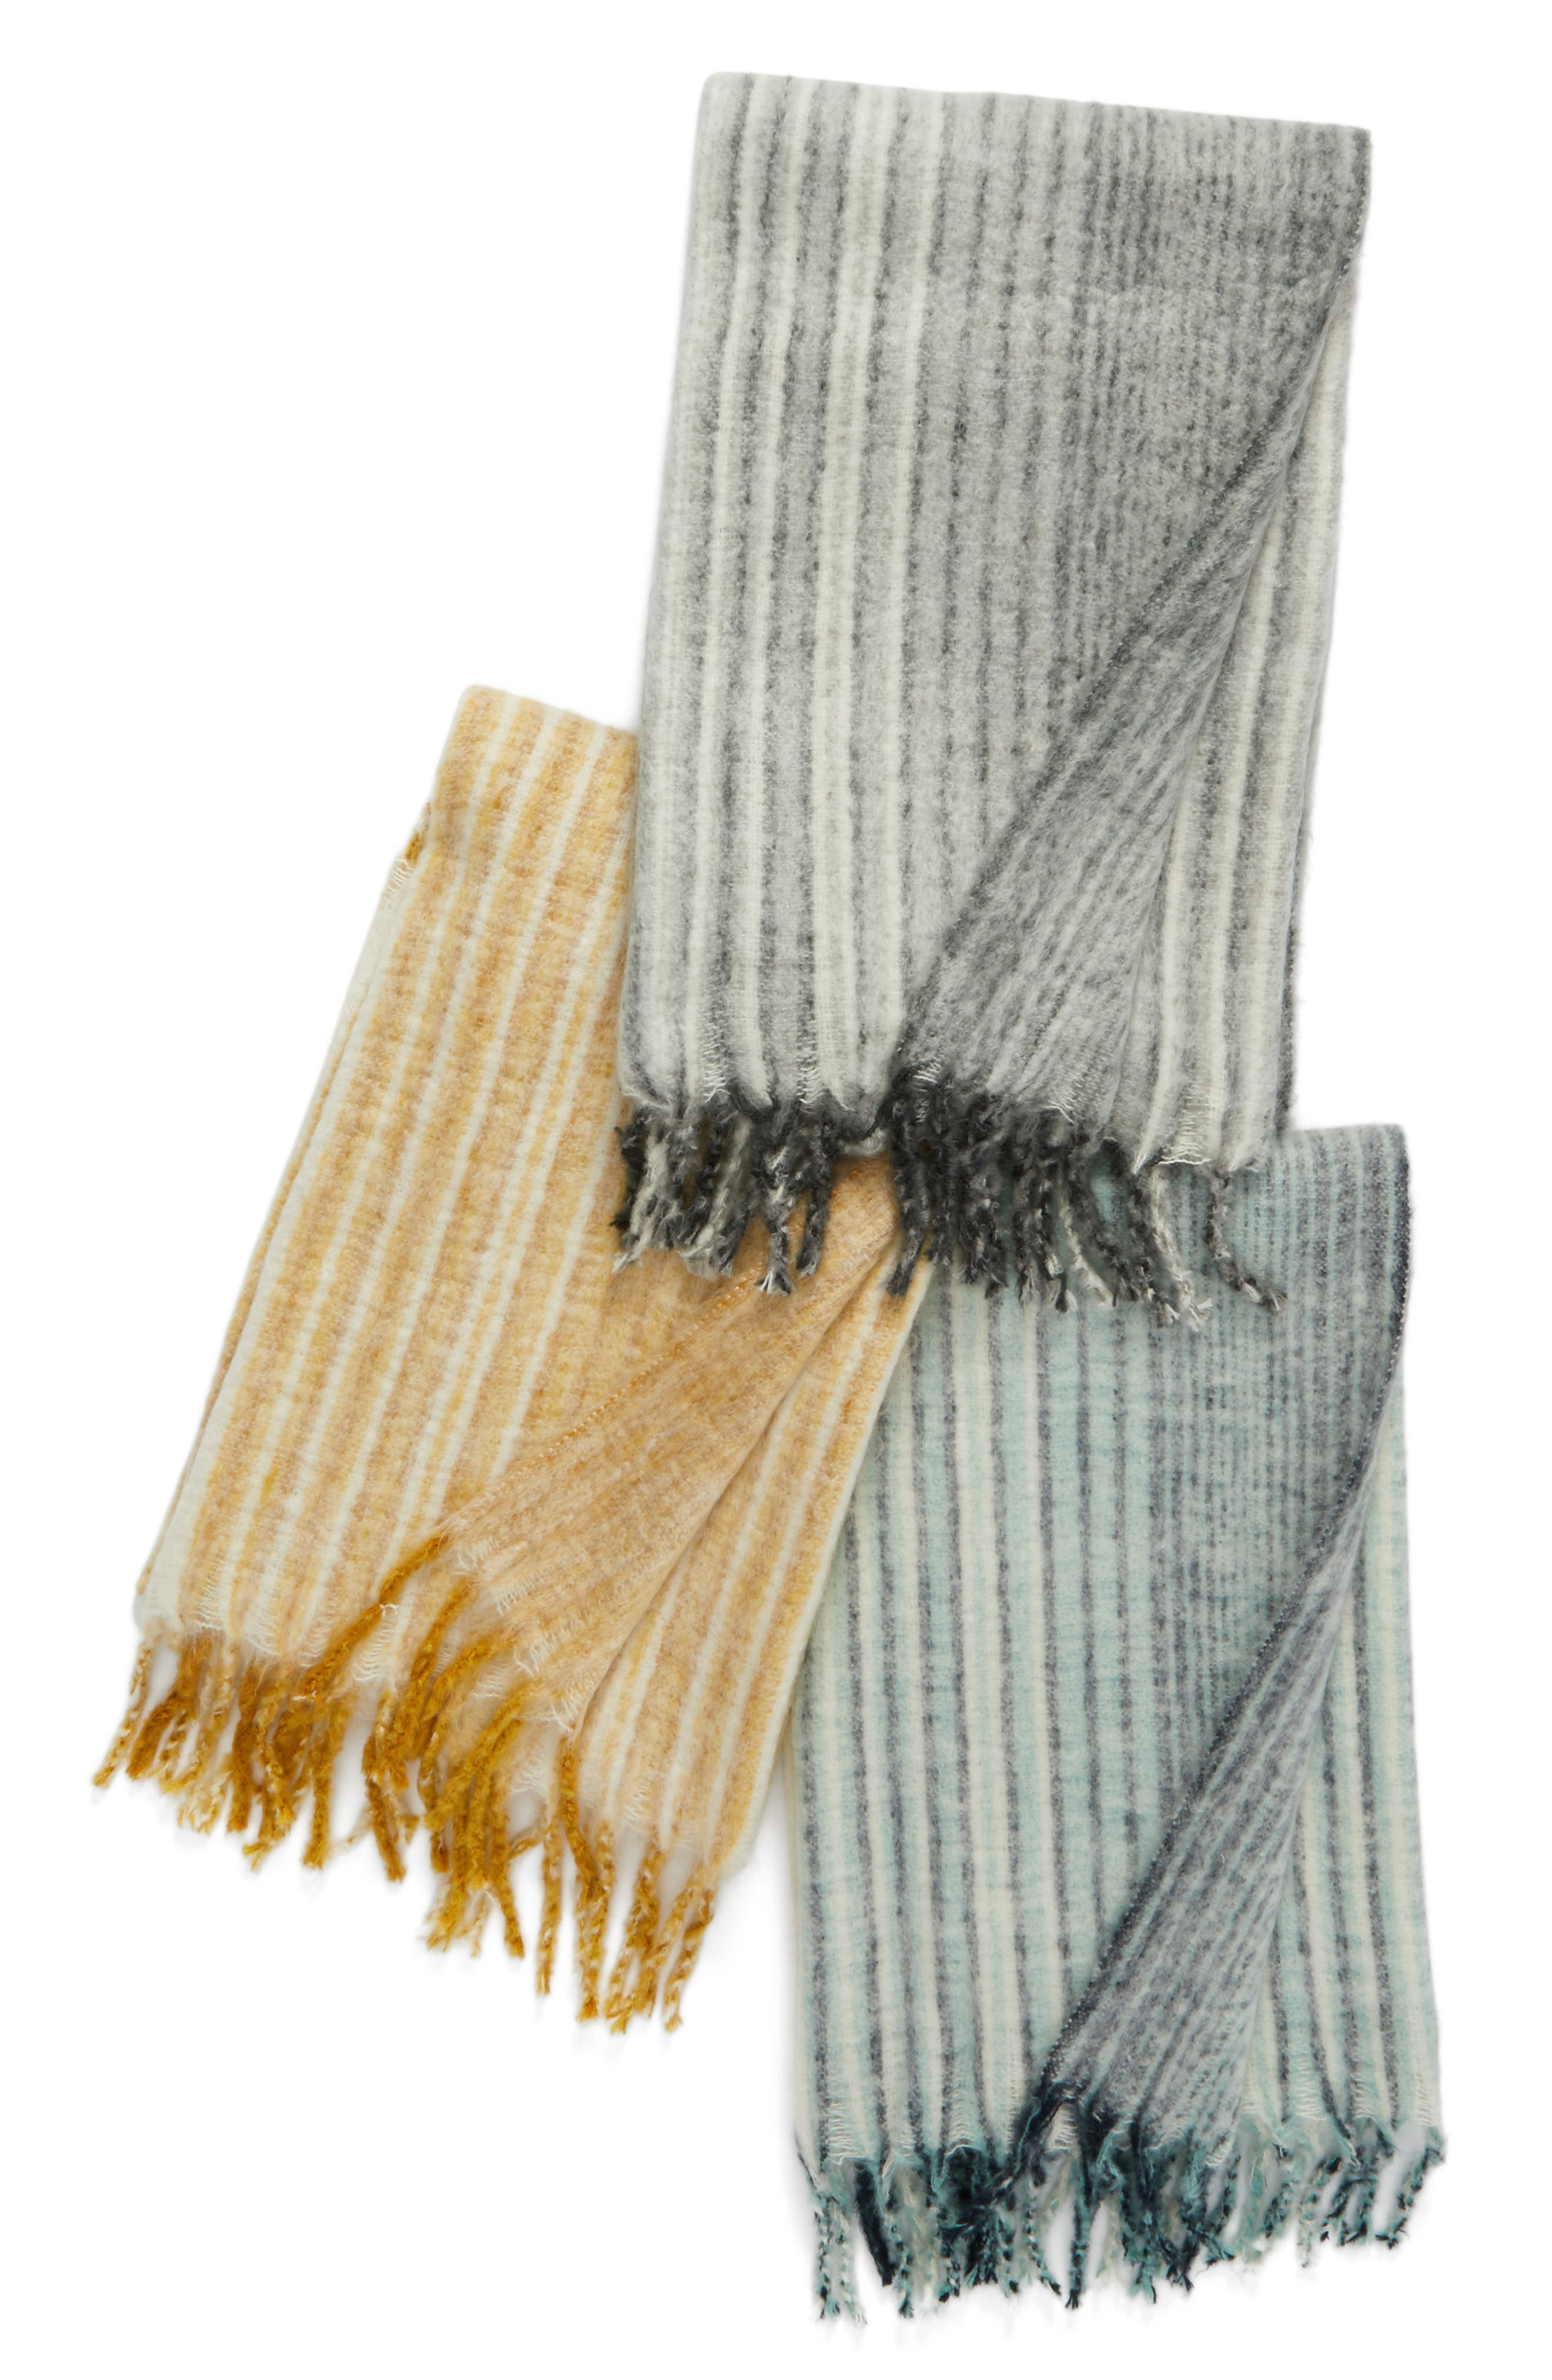 NORDSTROM AT HOME,                             Brushed Ombré Throw Blanket,                             Alternate thumbnail 3, color,                             020